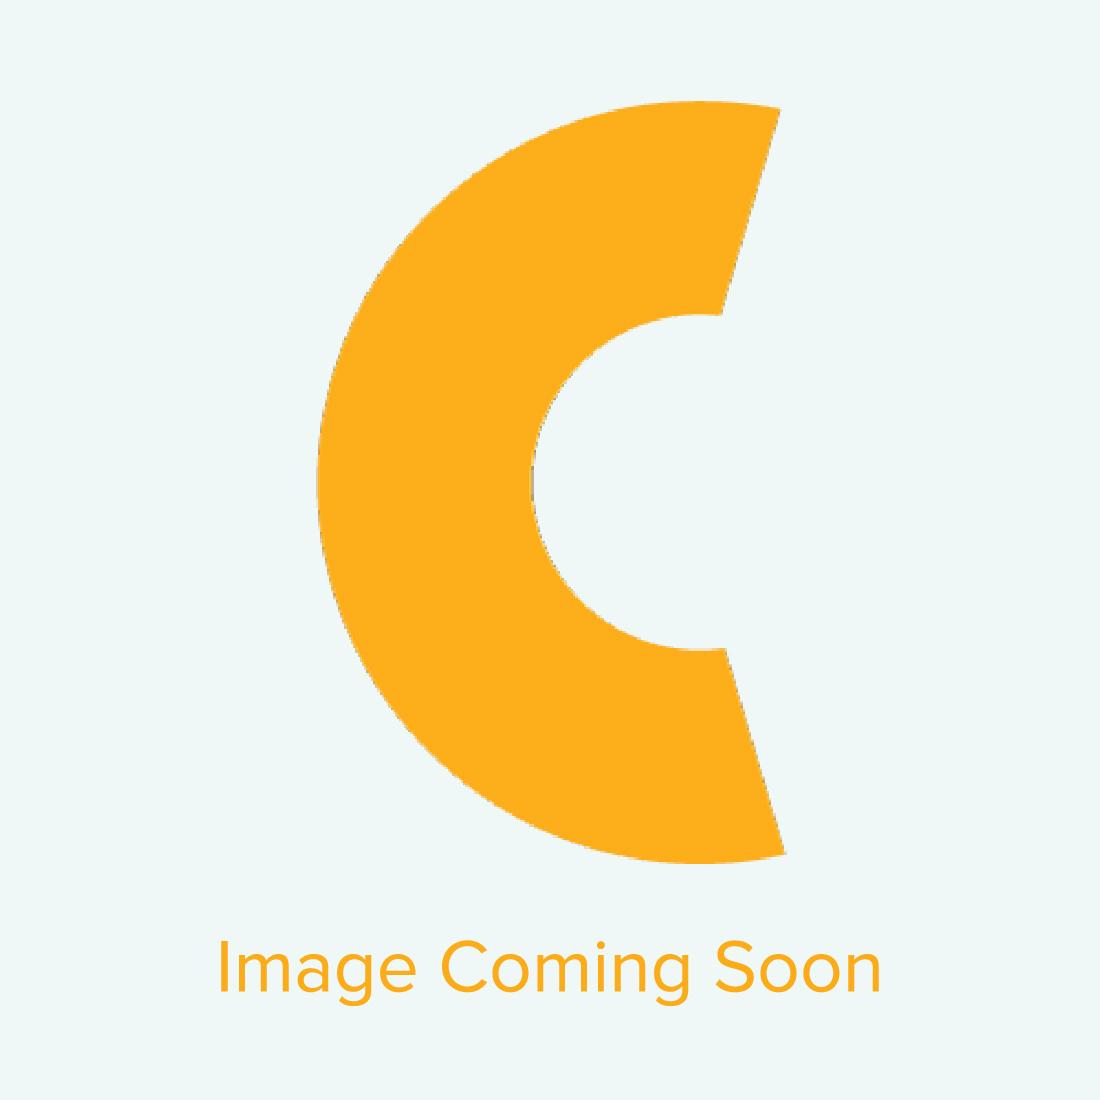 "Long Rectangle Sublimation Insert for Bezel Pendant – 0.5"" x 2"" (25/case)"